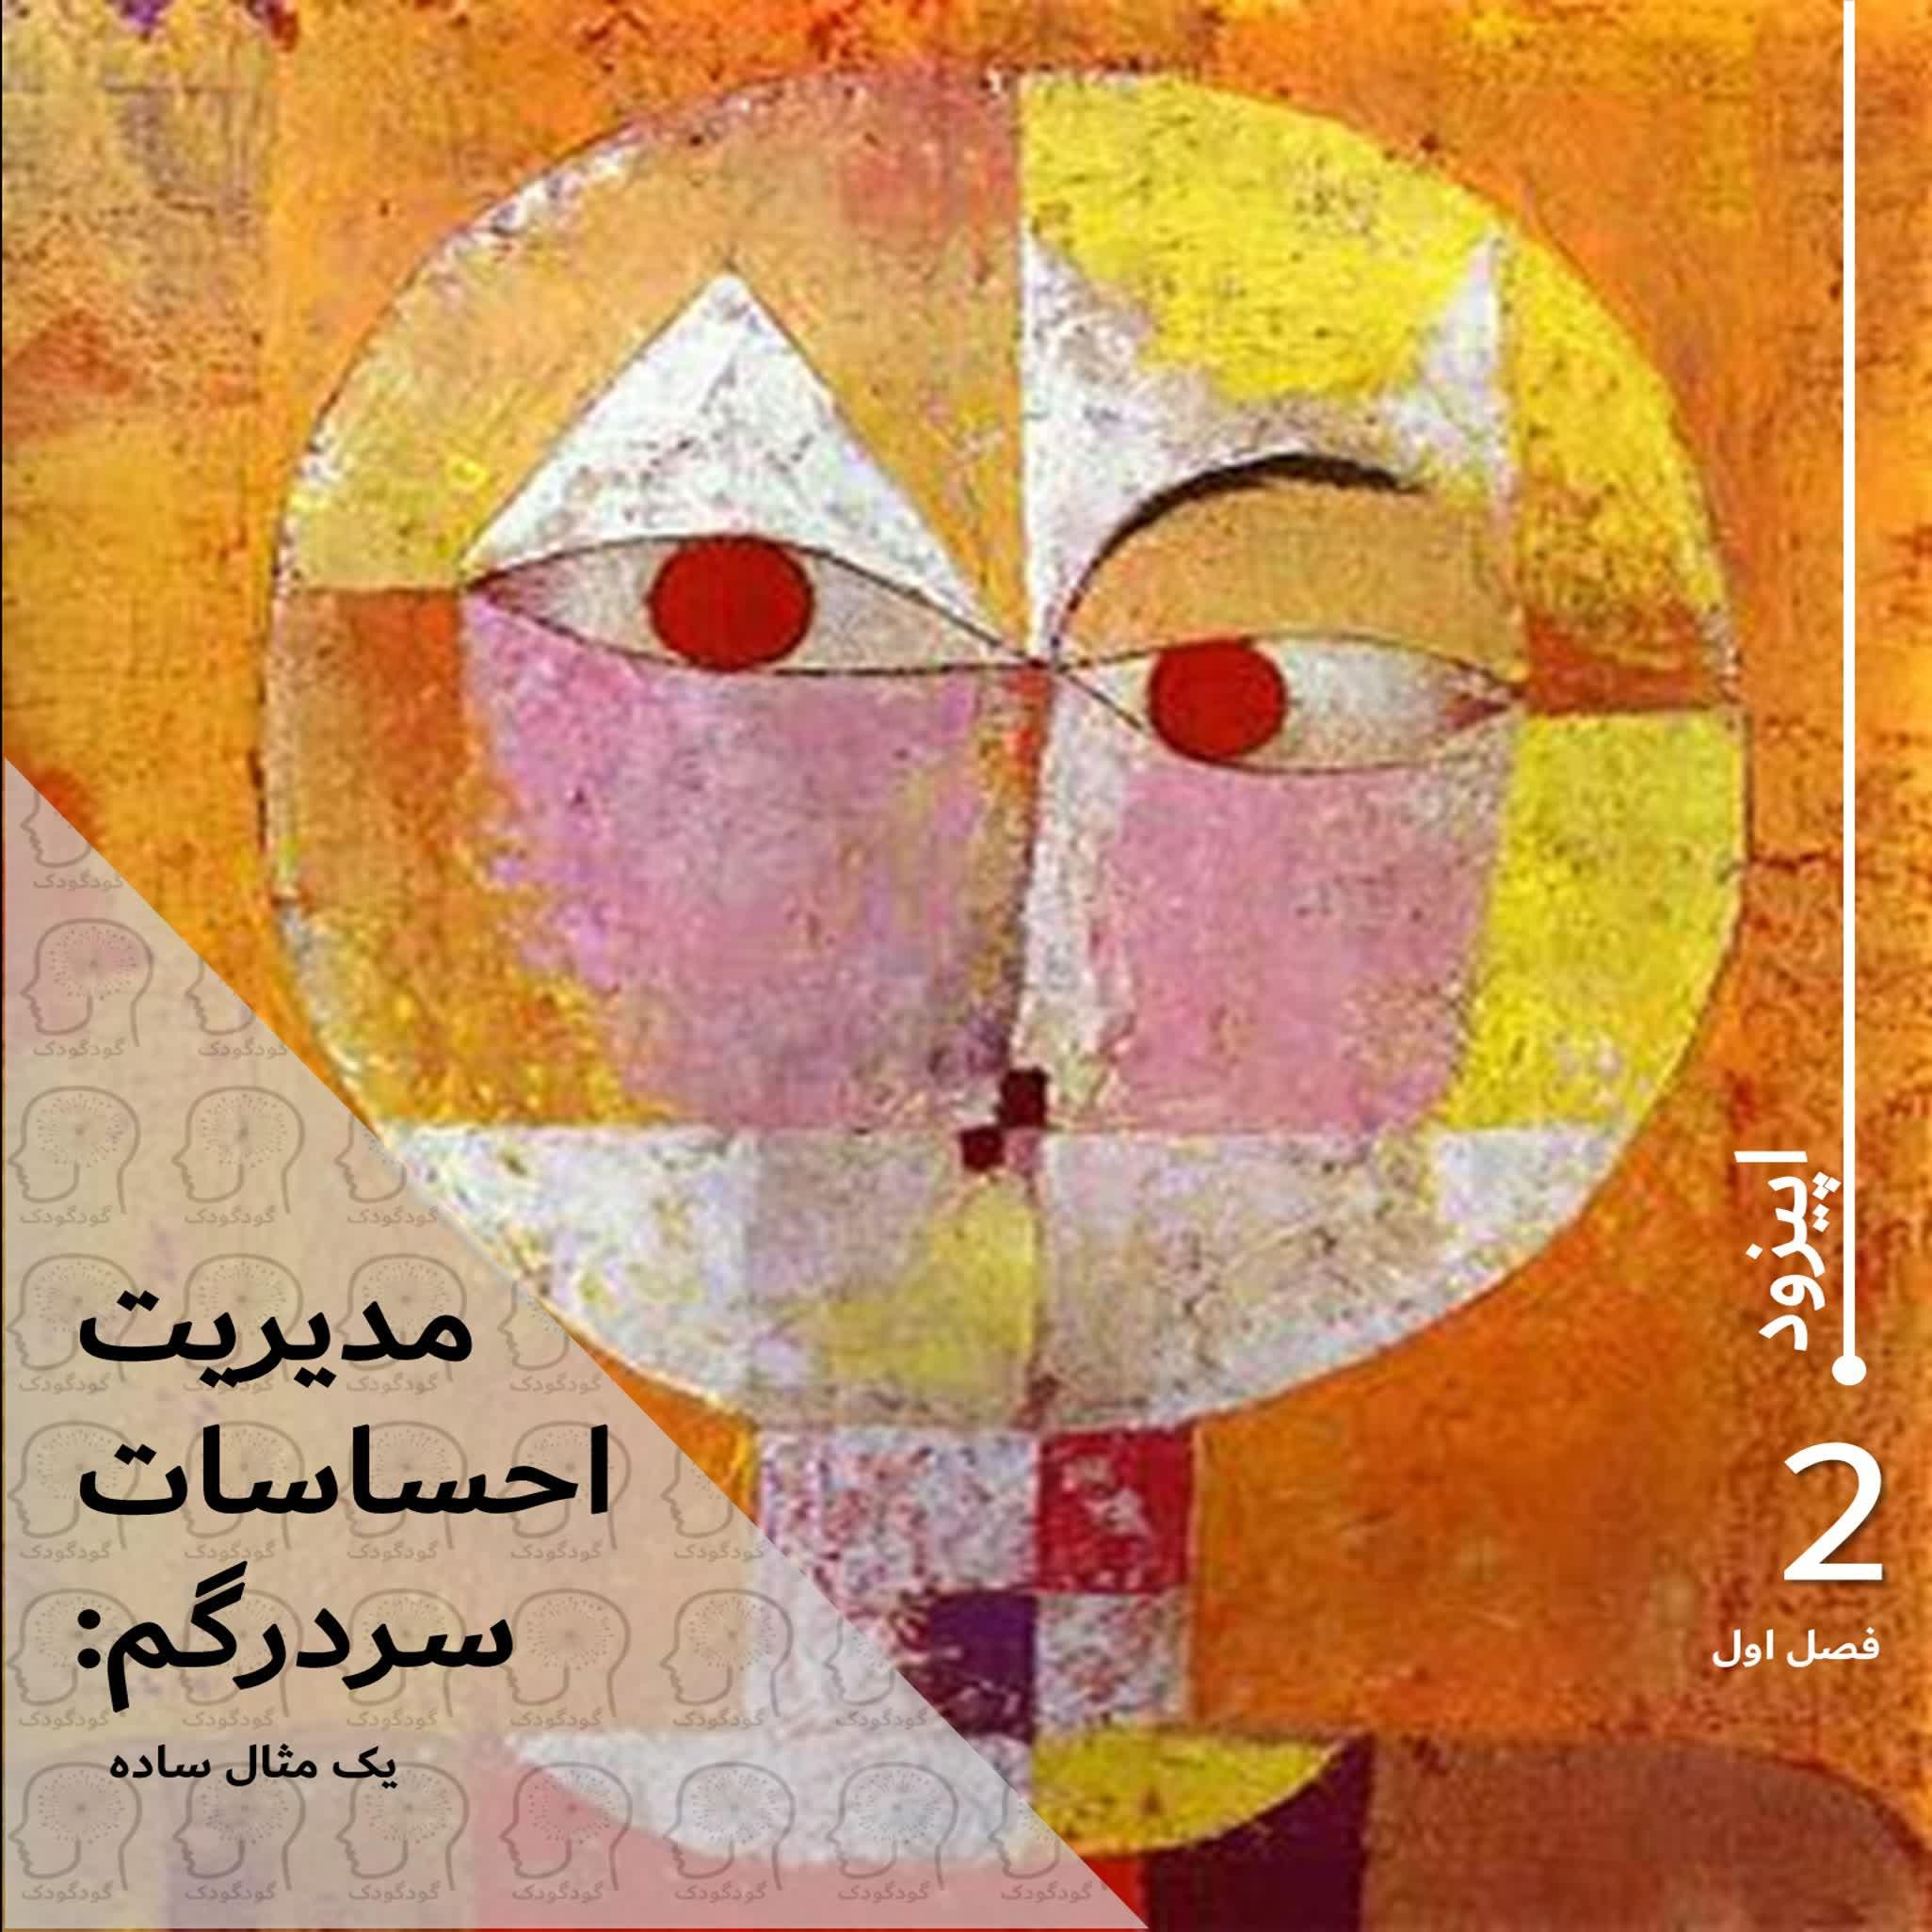 E02(3)  مدیریت احساسات سردرگم با یک مثال